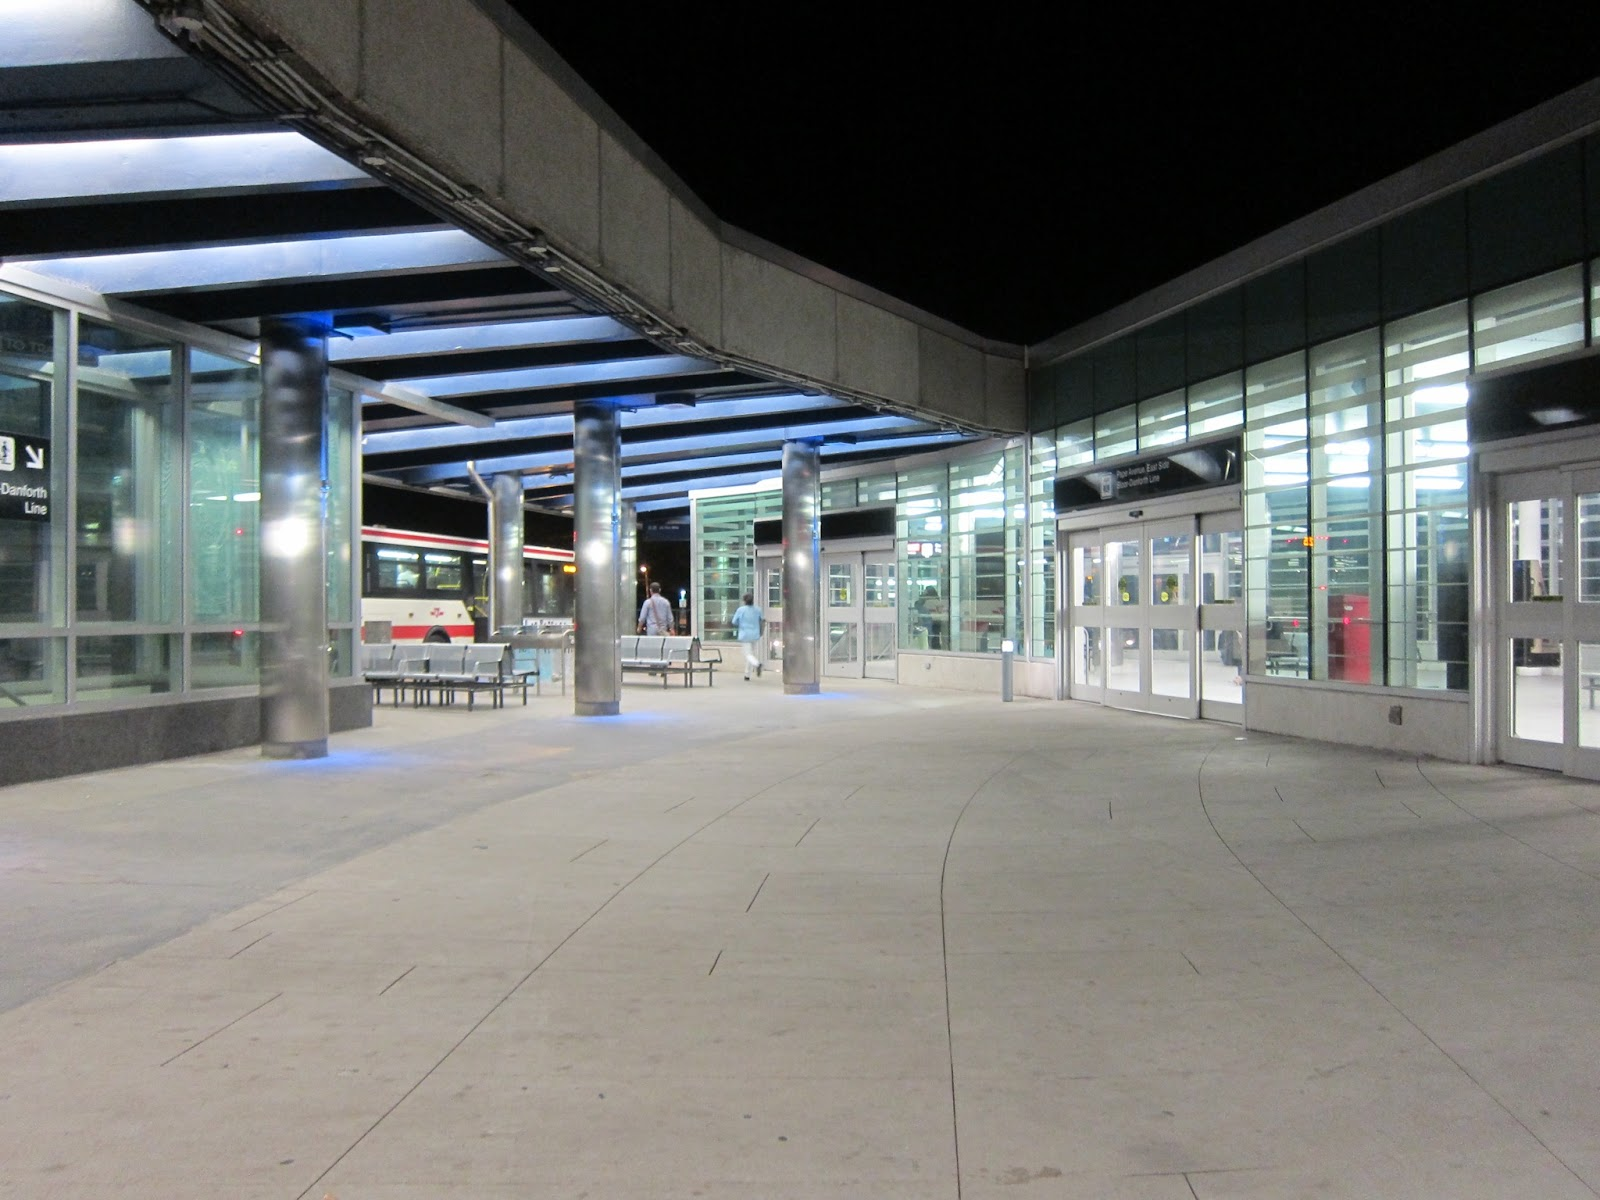 Pape station bus platform